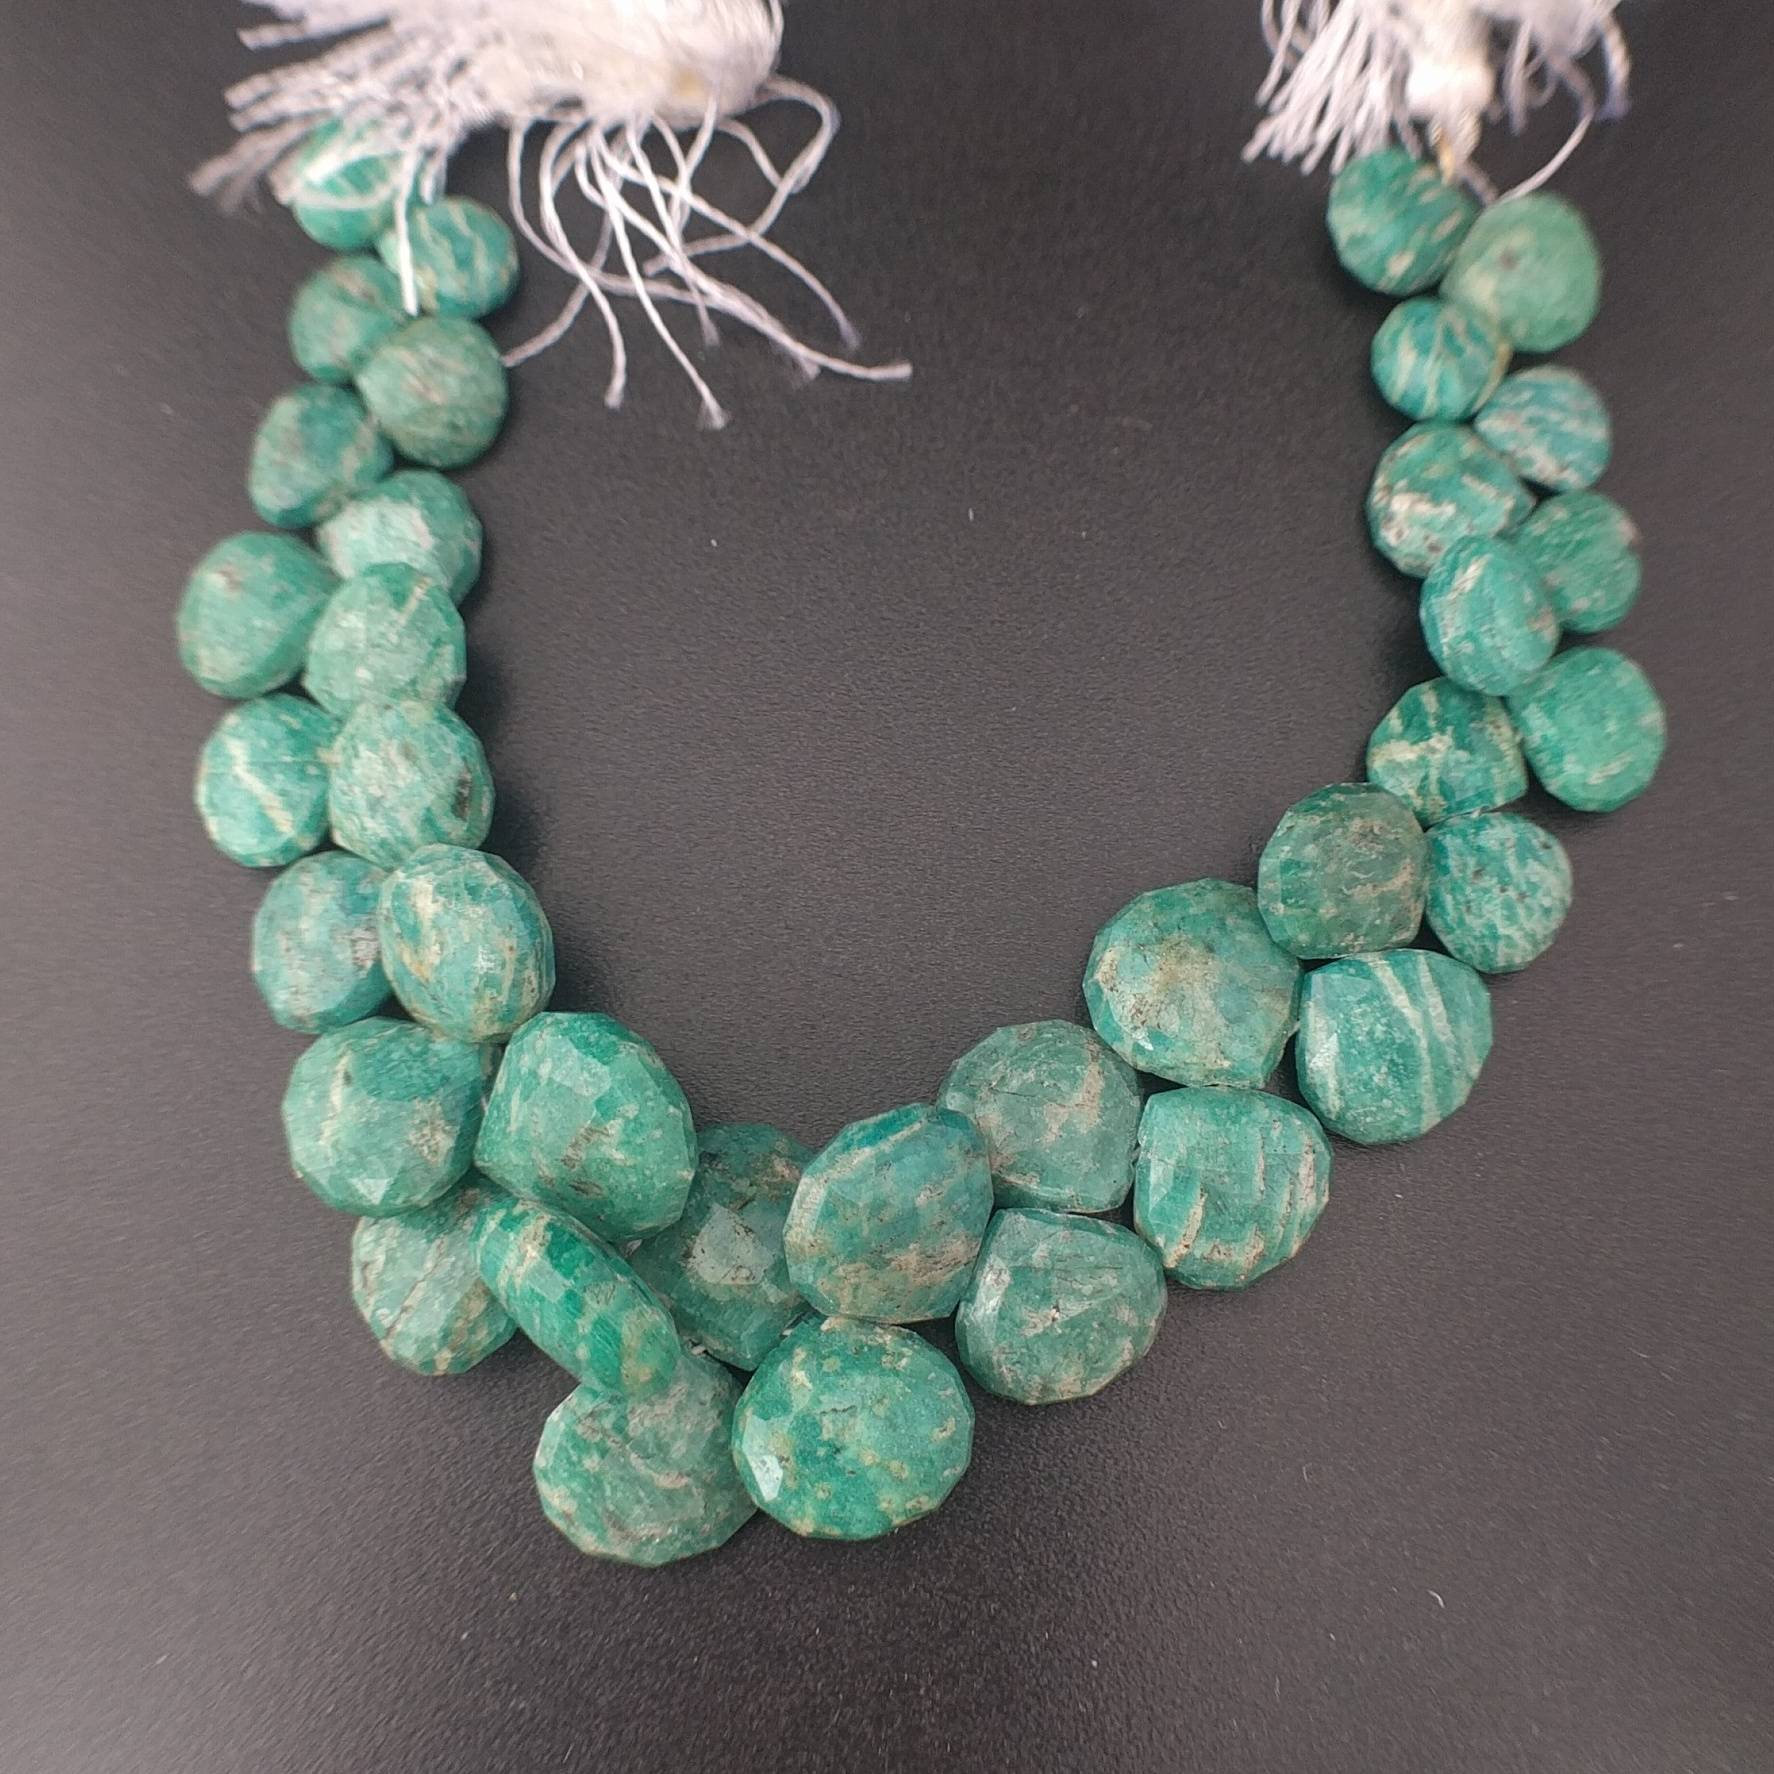 Natural AMAZONITE Briolette Gemstone Beads 8X12 MM pentagon Shape 10 pecs GU-804